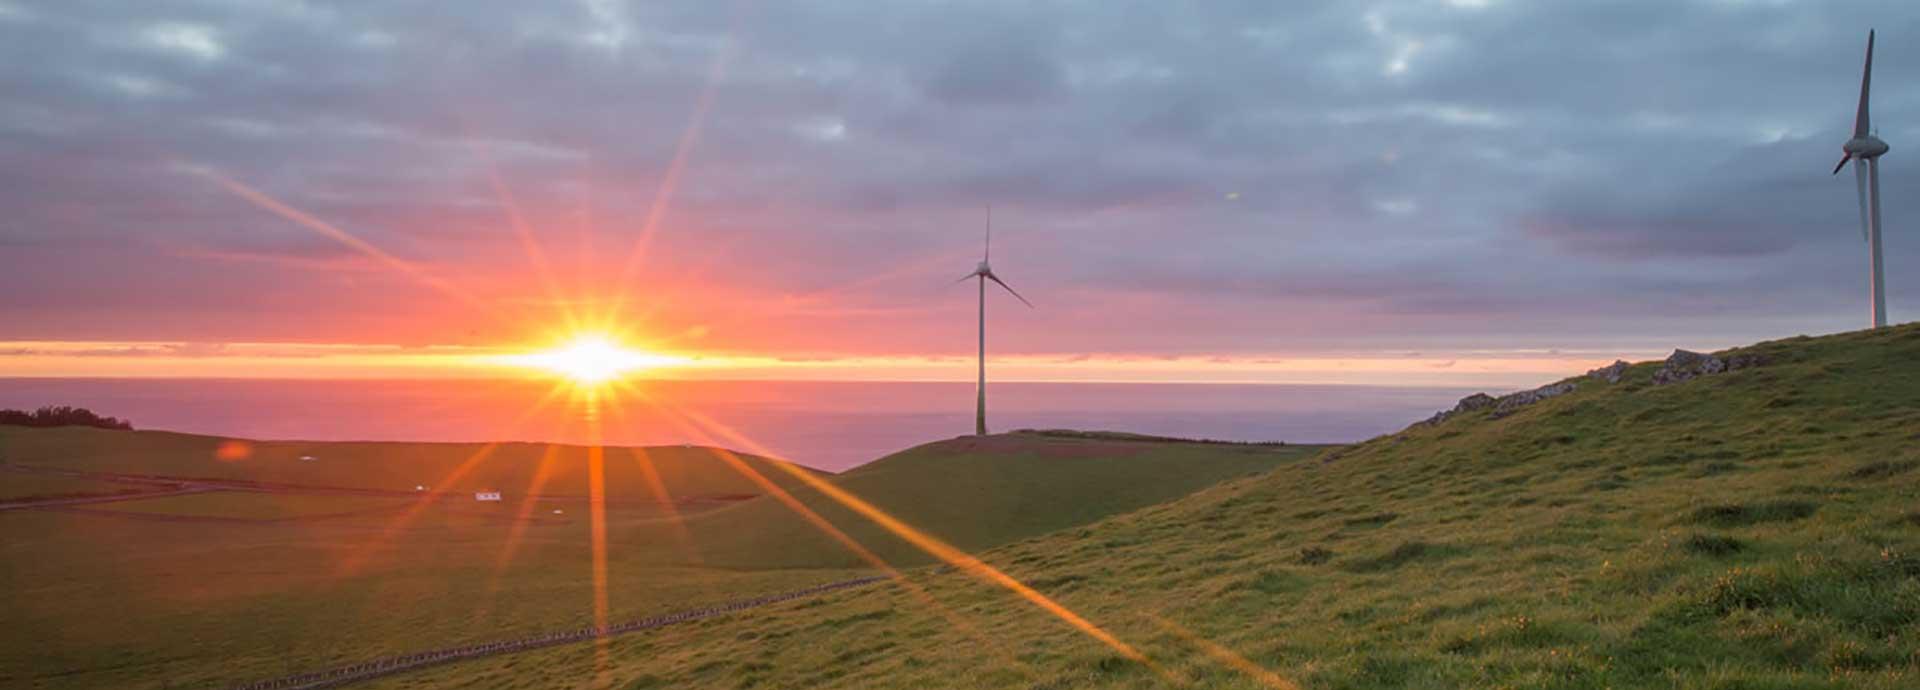 Graciosa on the Path to 100% Renewable Energy